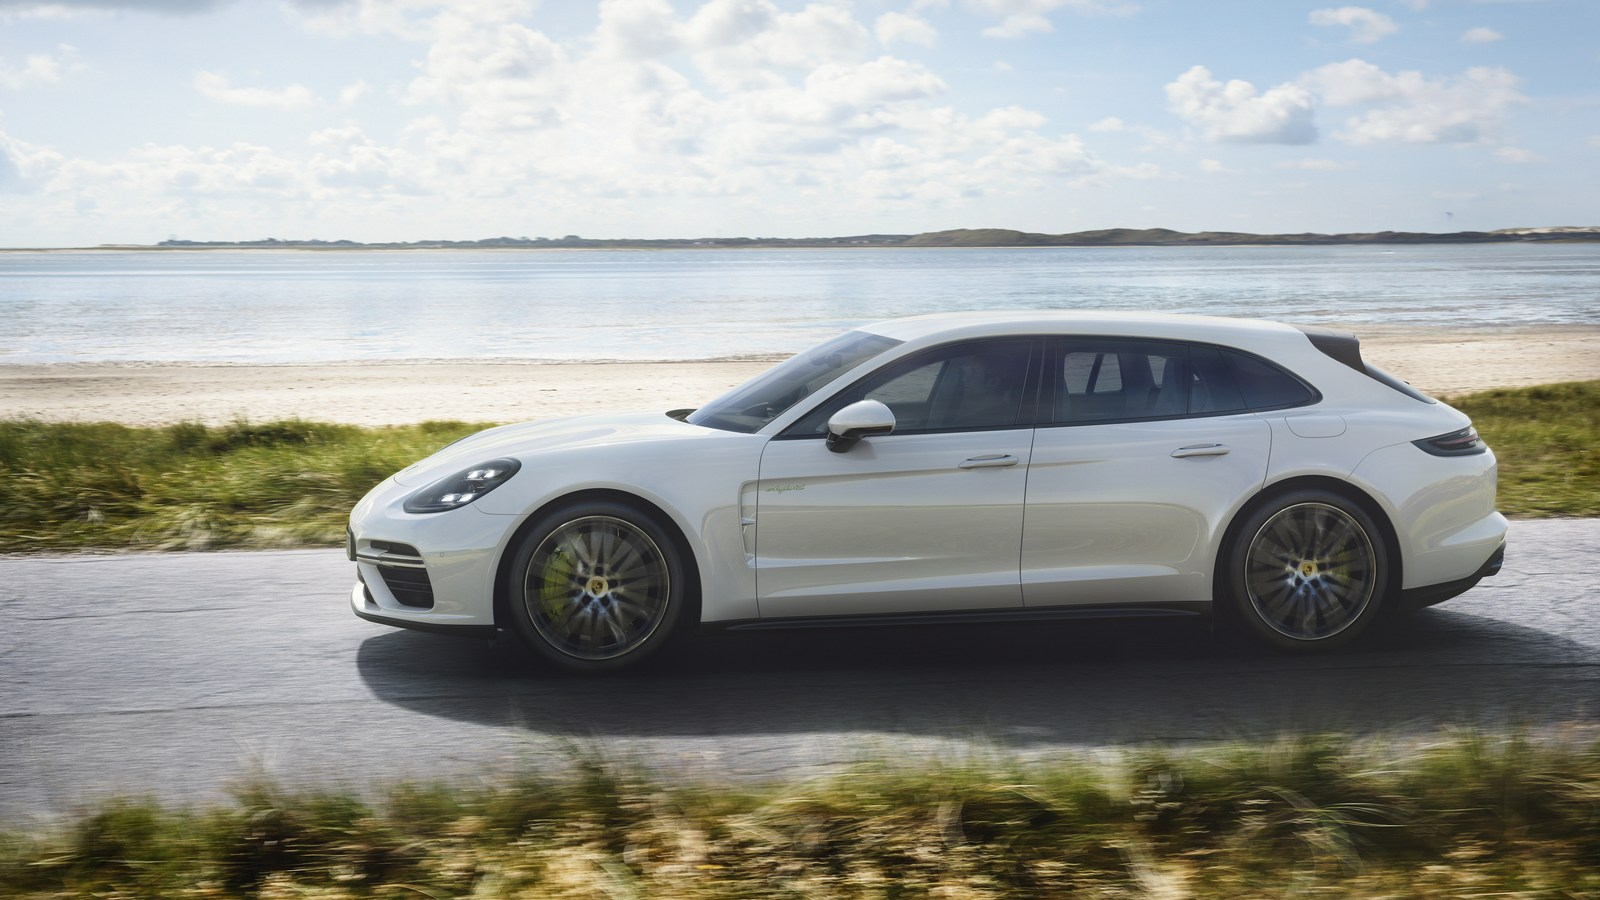 Porsche-Panamera-Turbo-S-E-Hybrid-Sport-Turismo-4